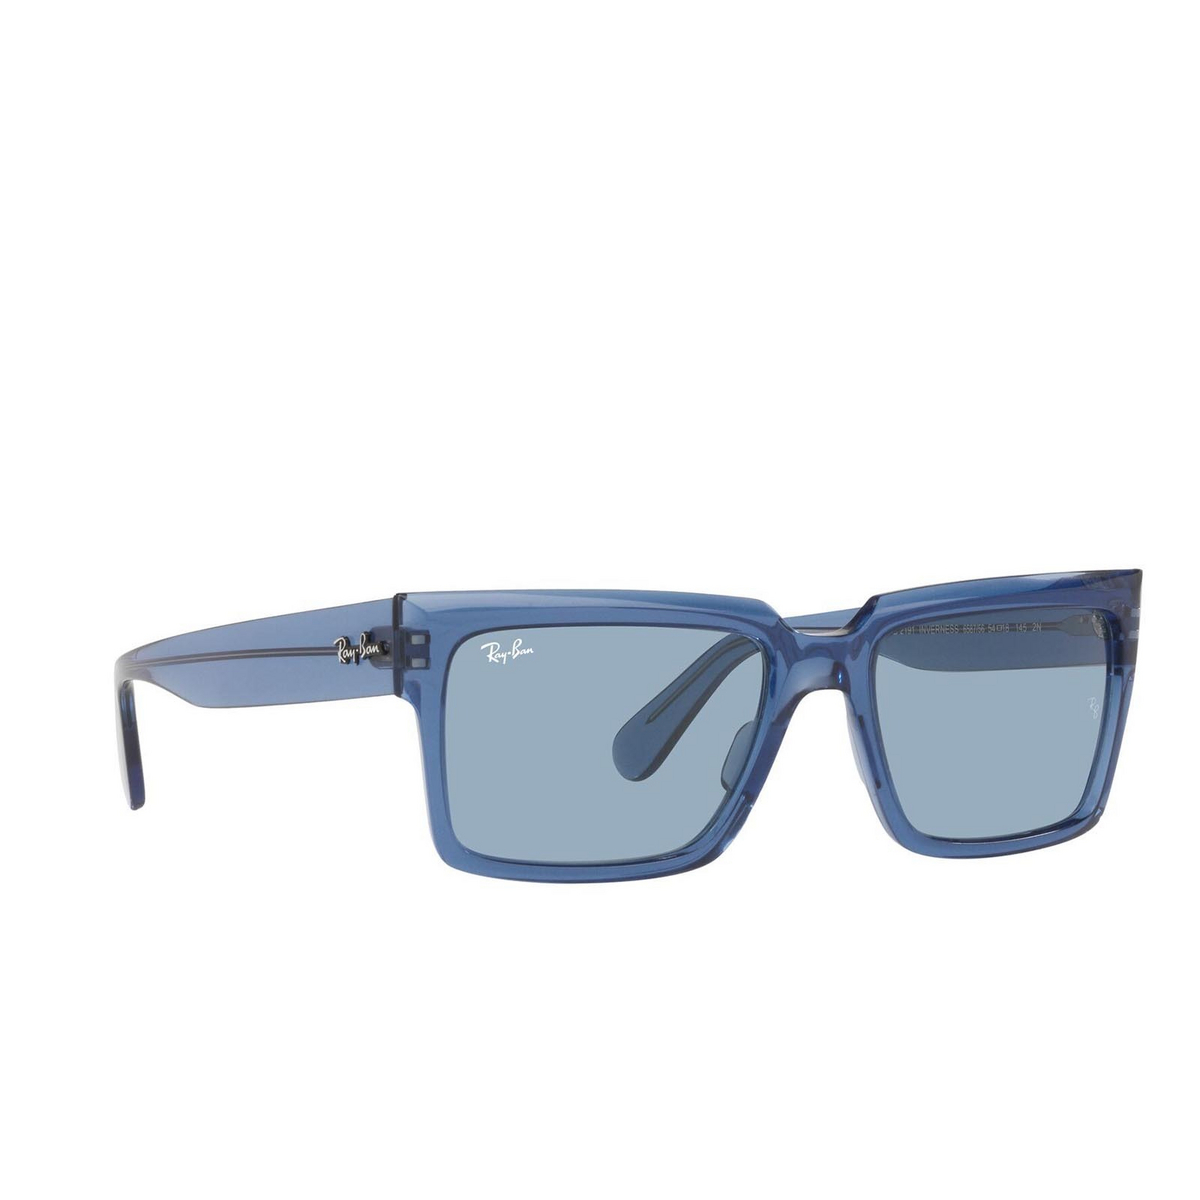 Ray-Ban® Square Sunglasses: Inverness RB2191 color True Blue 658756.